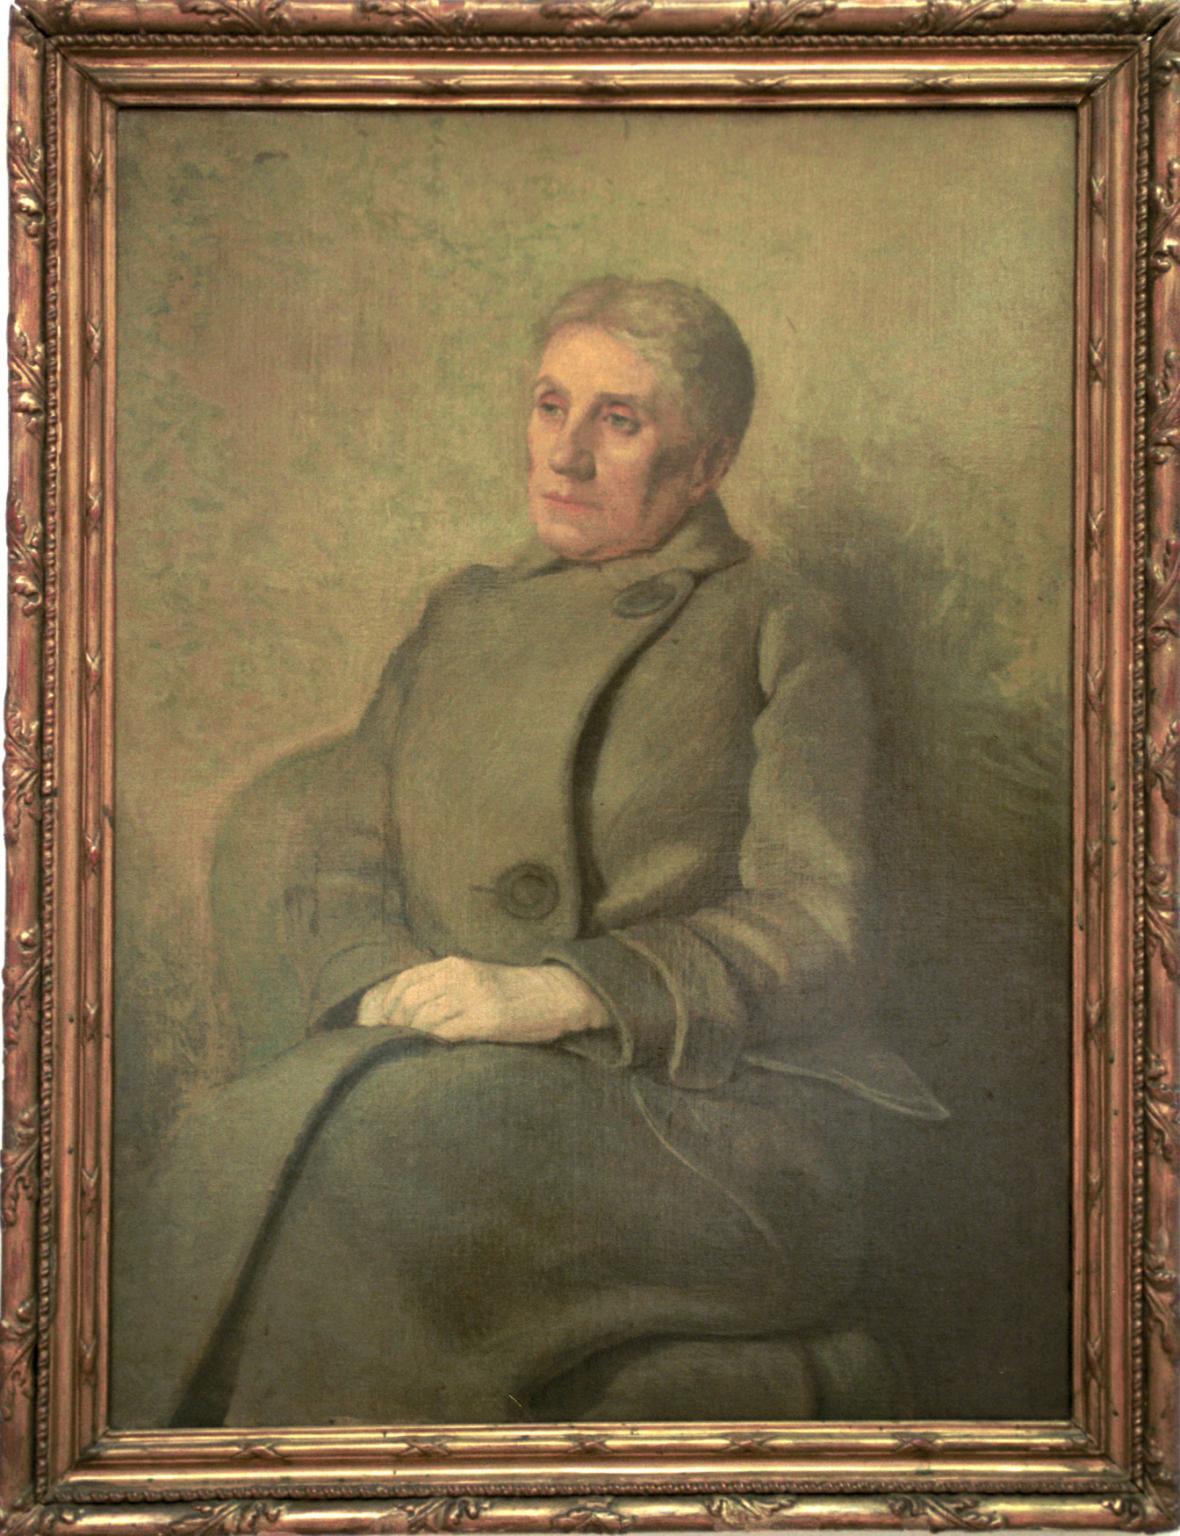 Charlotte Garrigue Masaryková